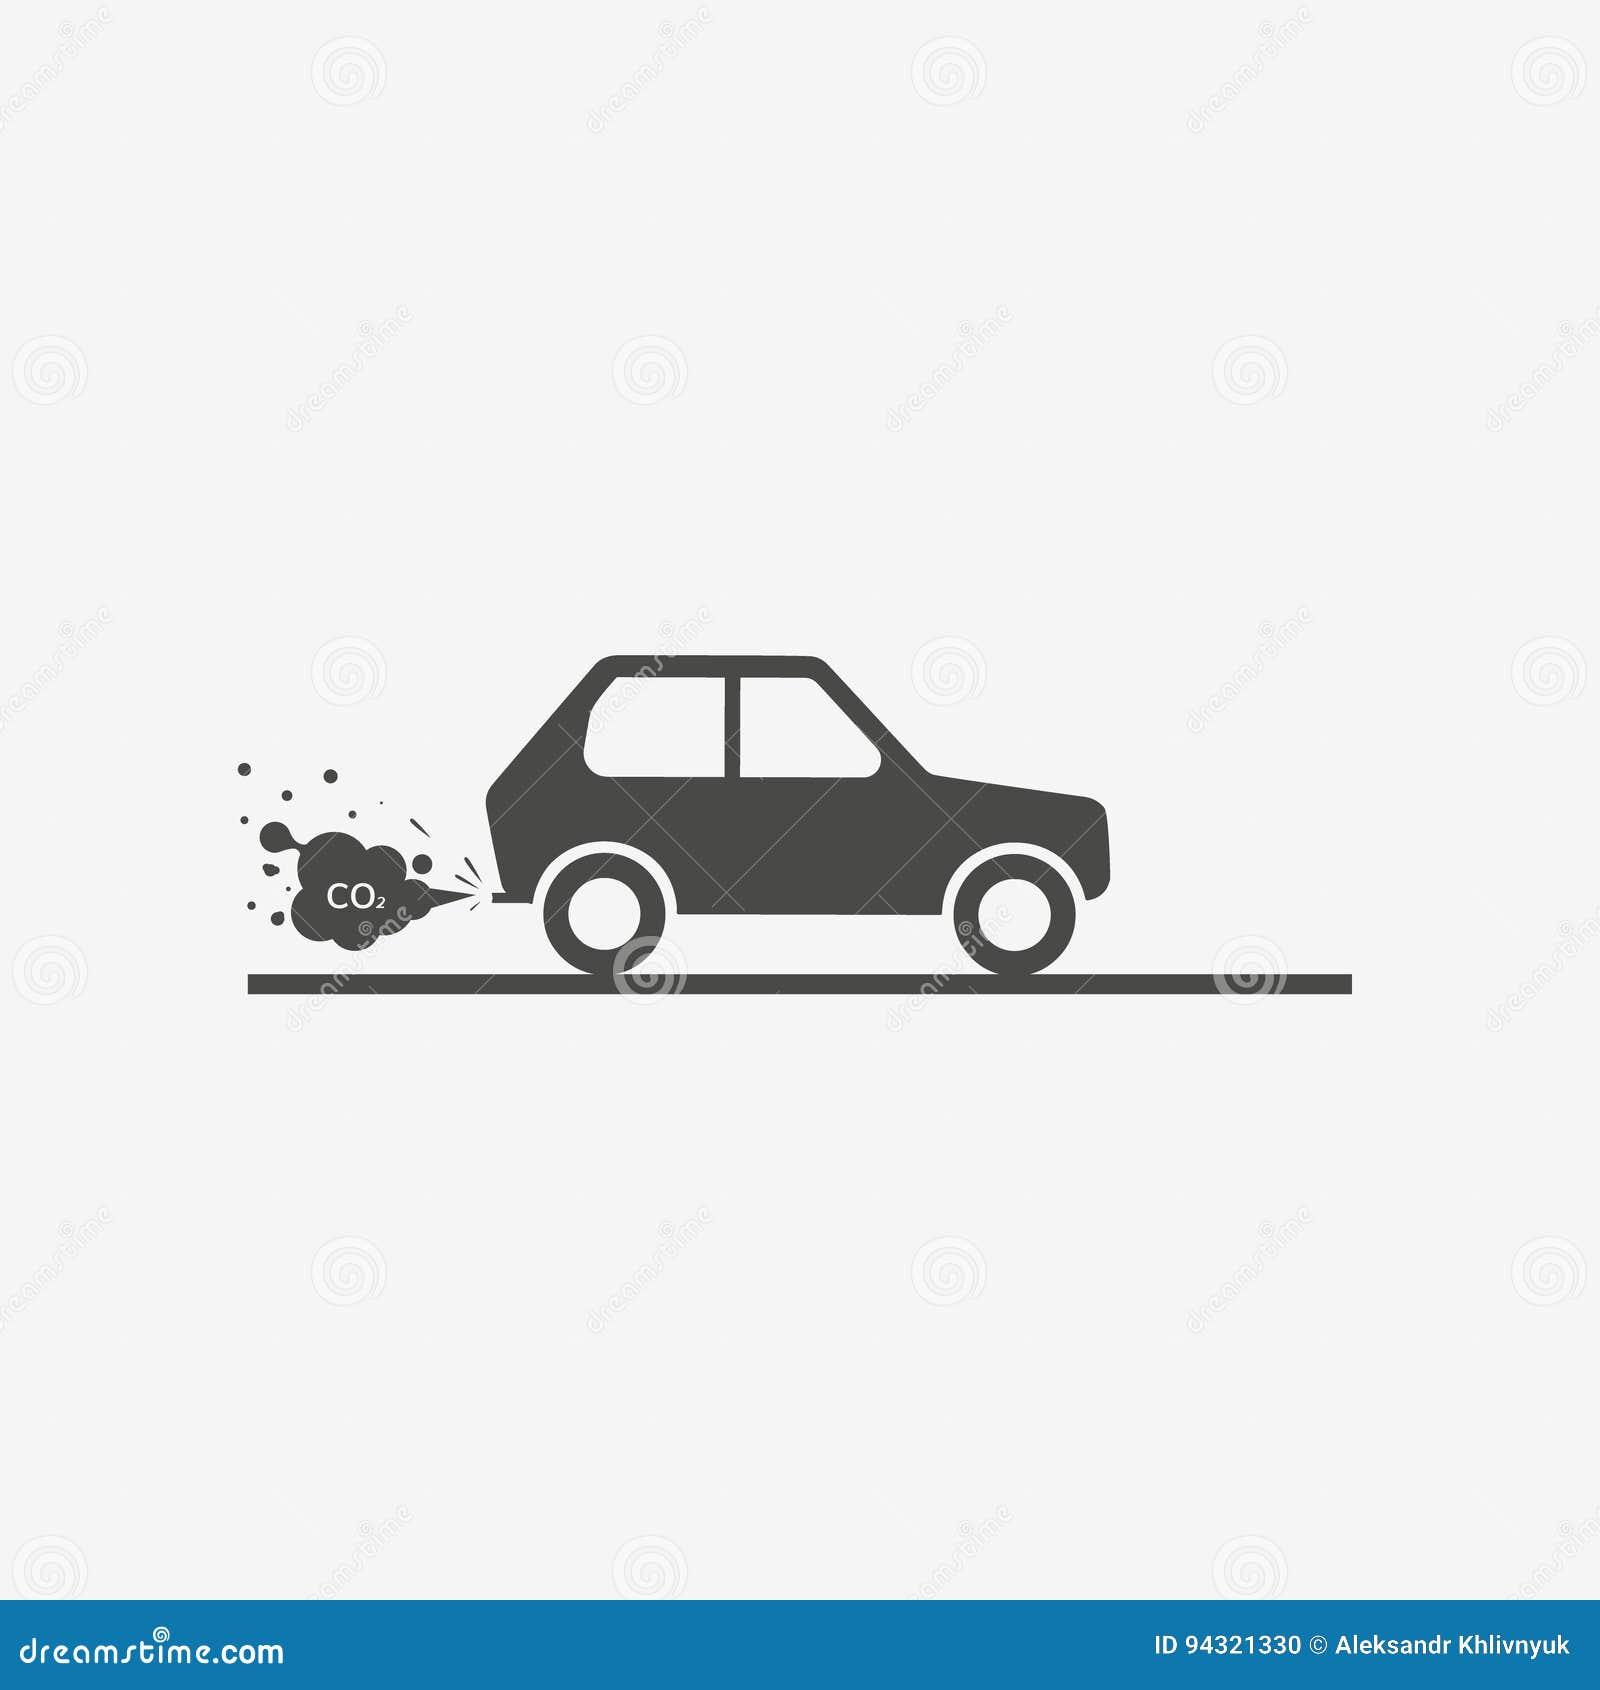 Car Exhaust Co2 Stock Illustration Illustration Of Environment